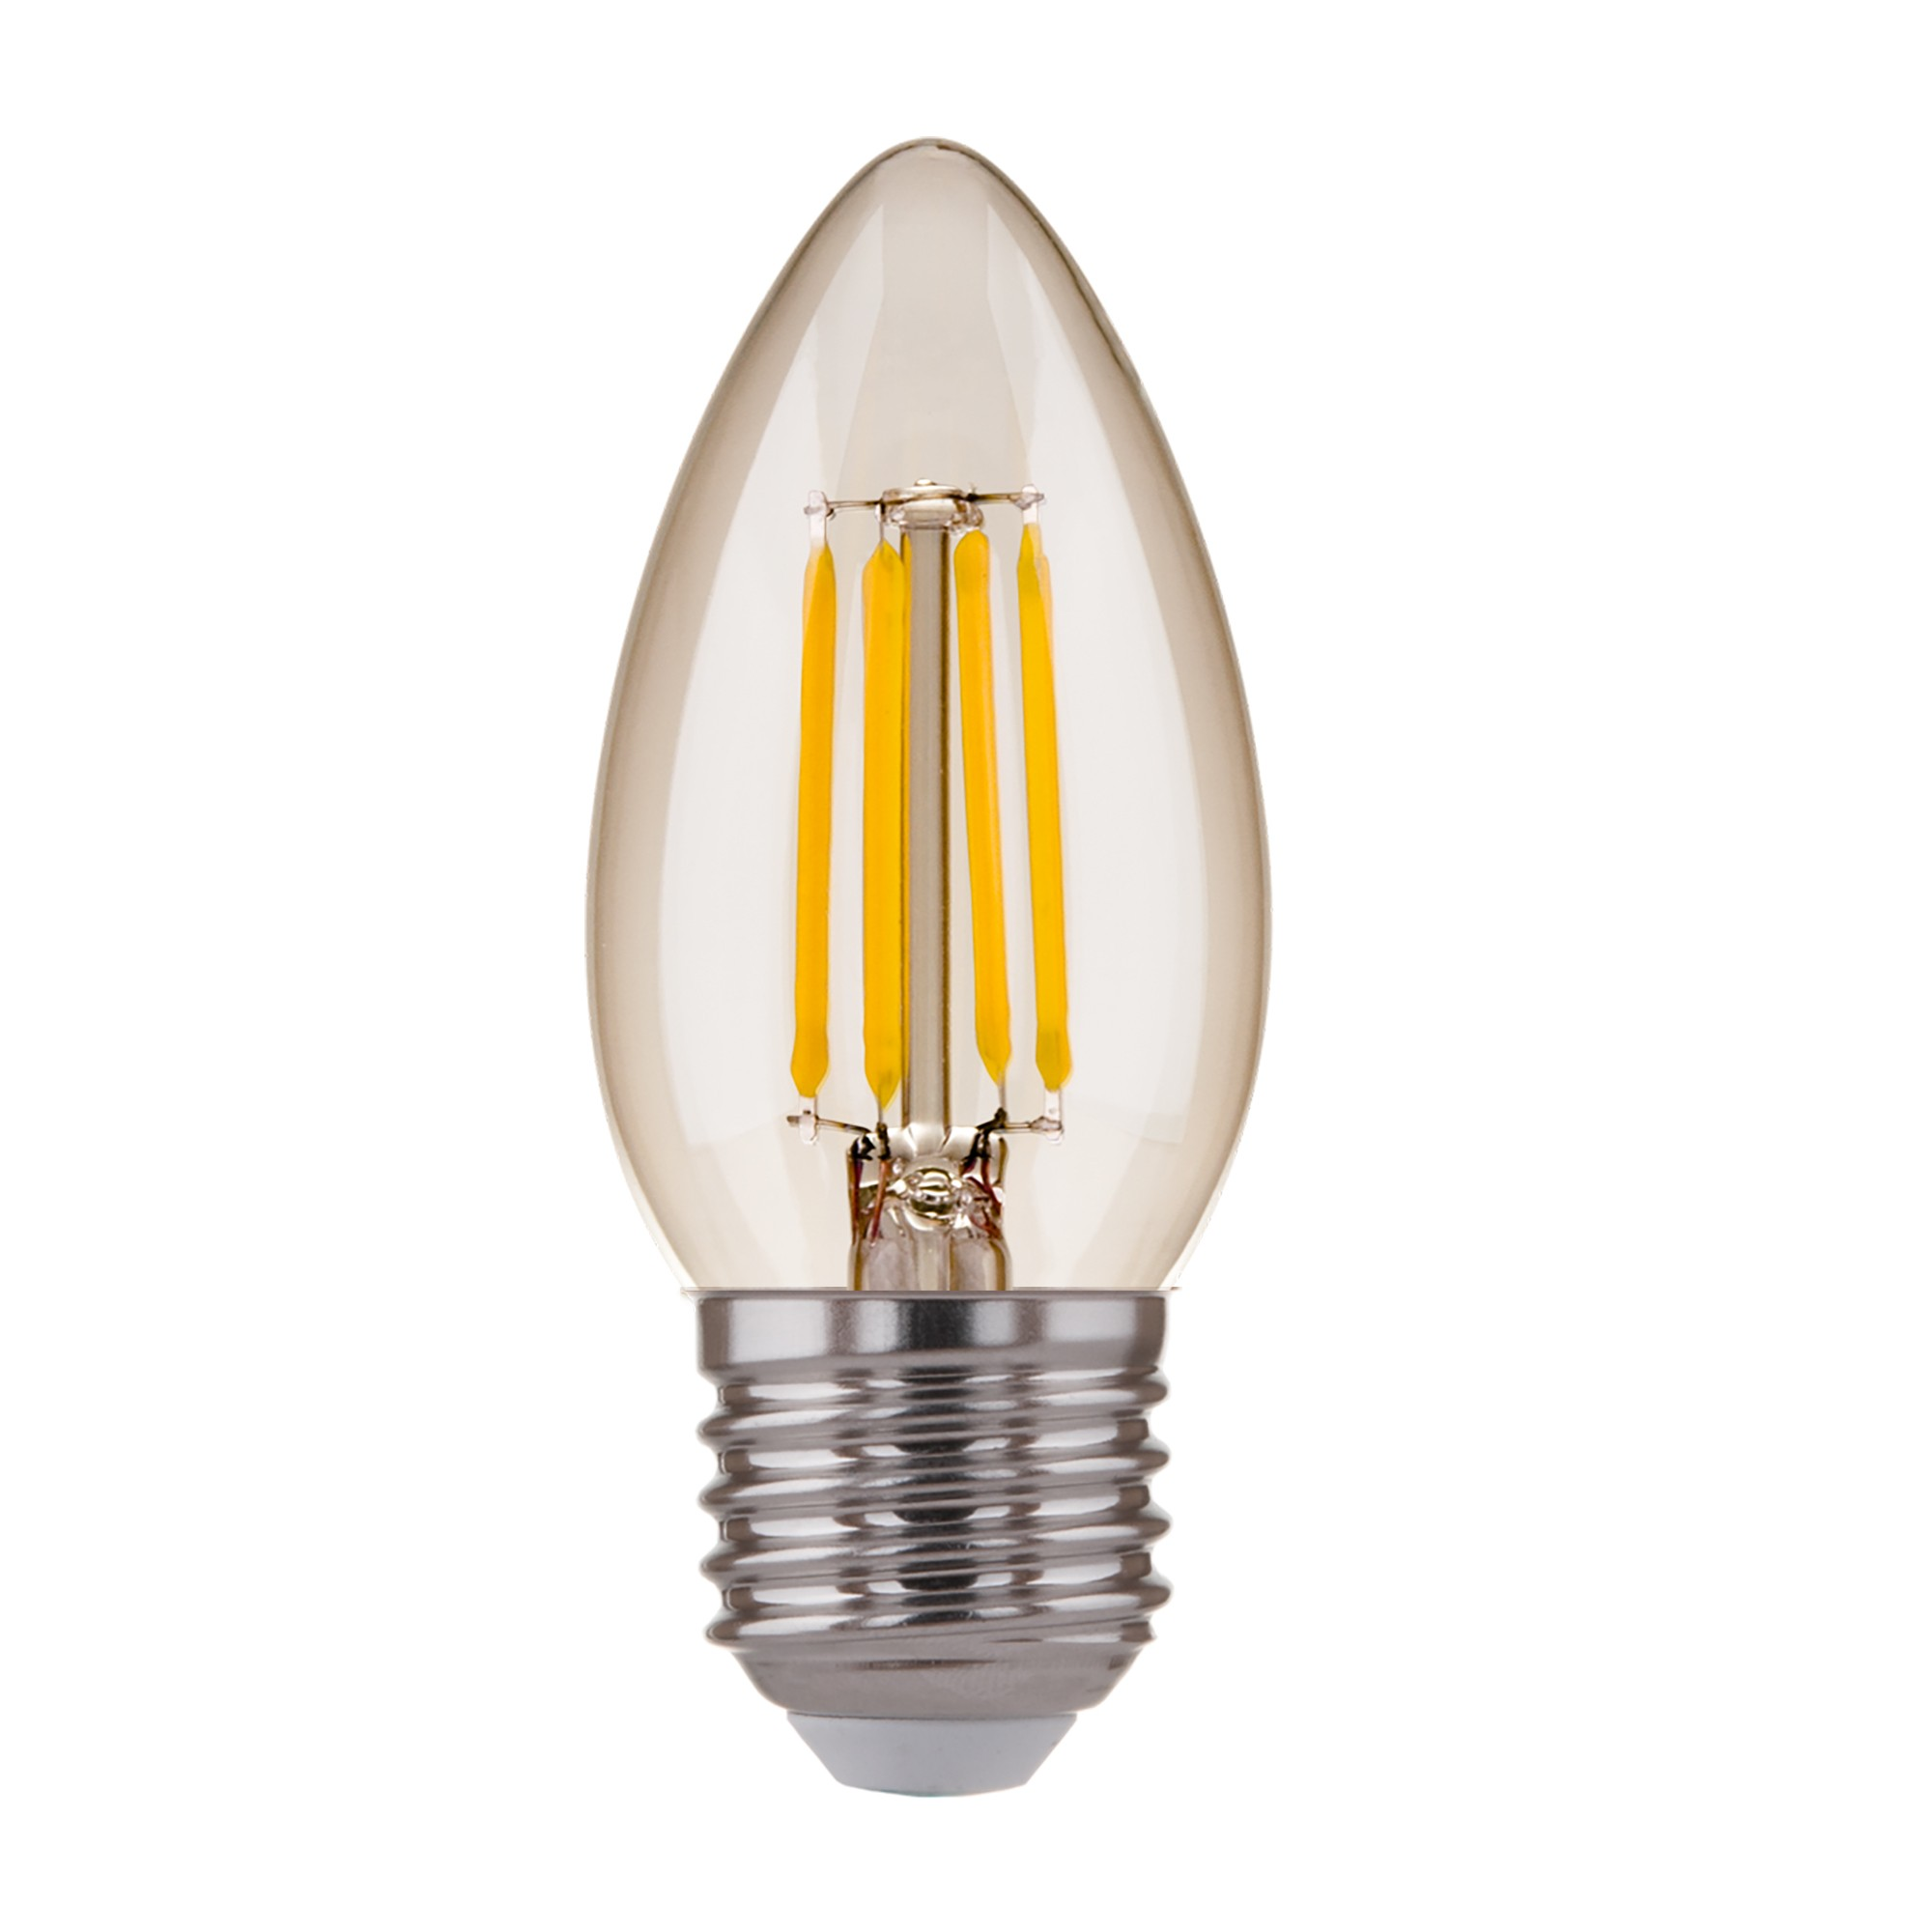 Свеча BLE2706 F 9W 4200K E27 (C35 прозрачный)